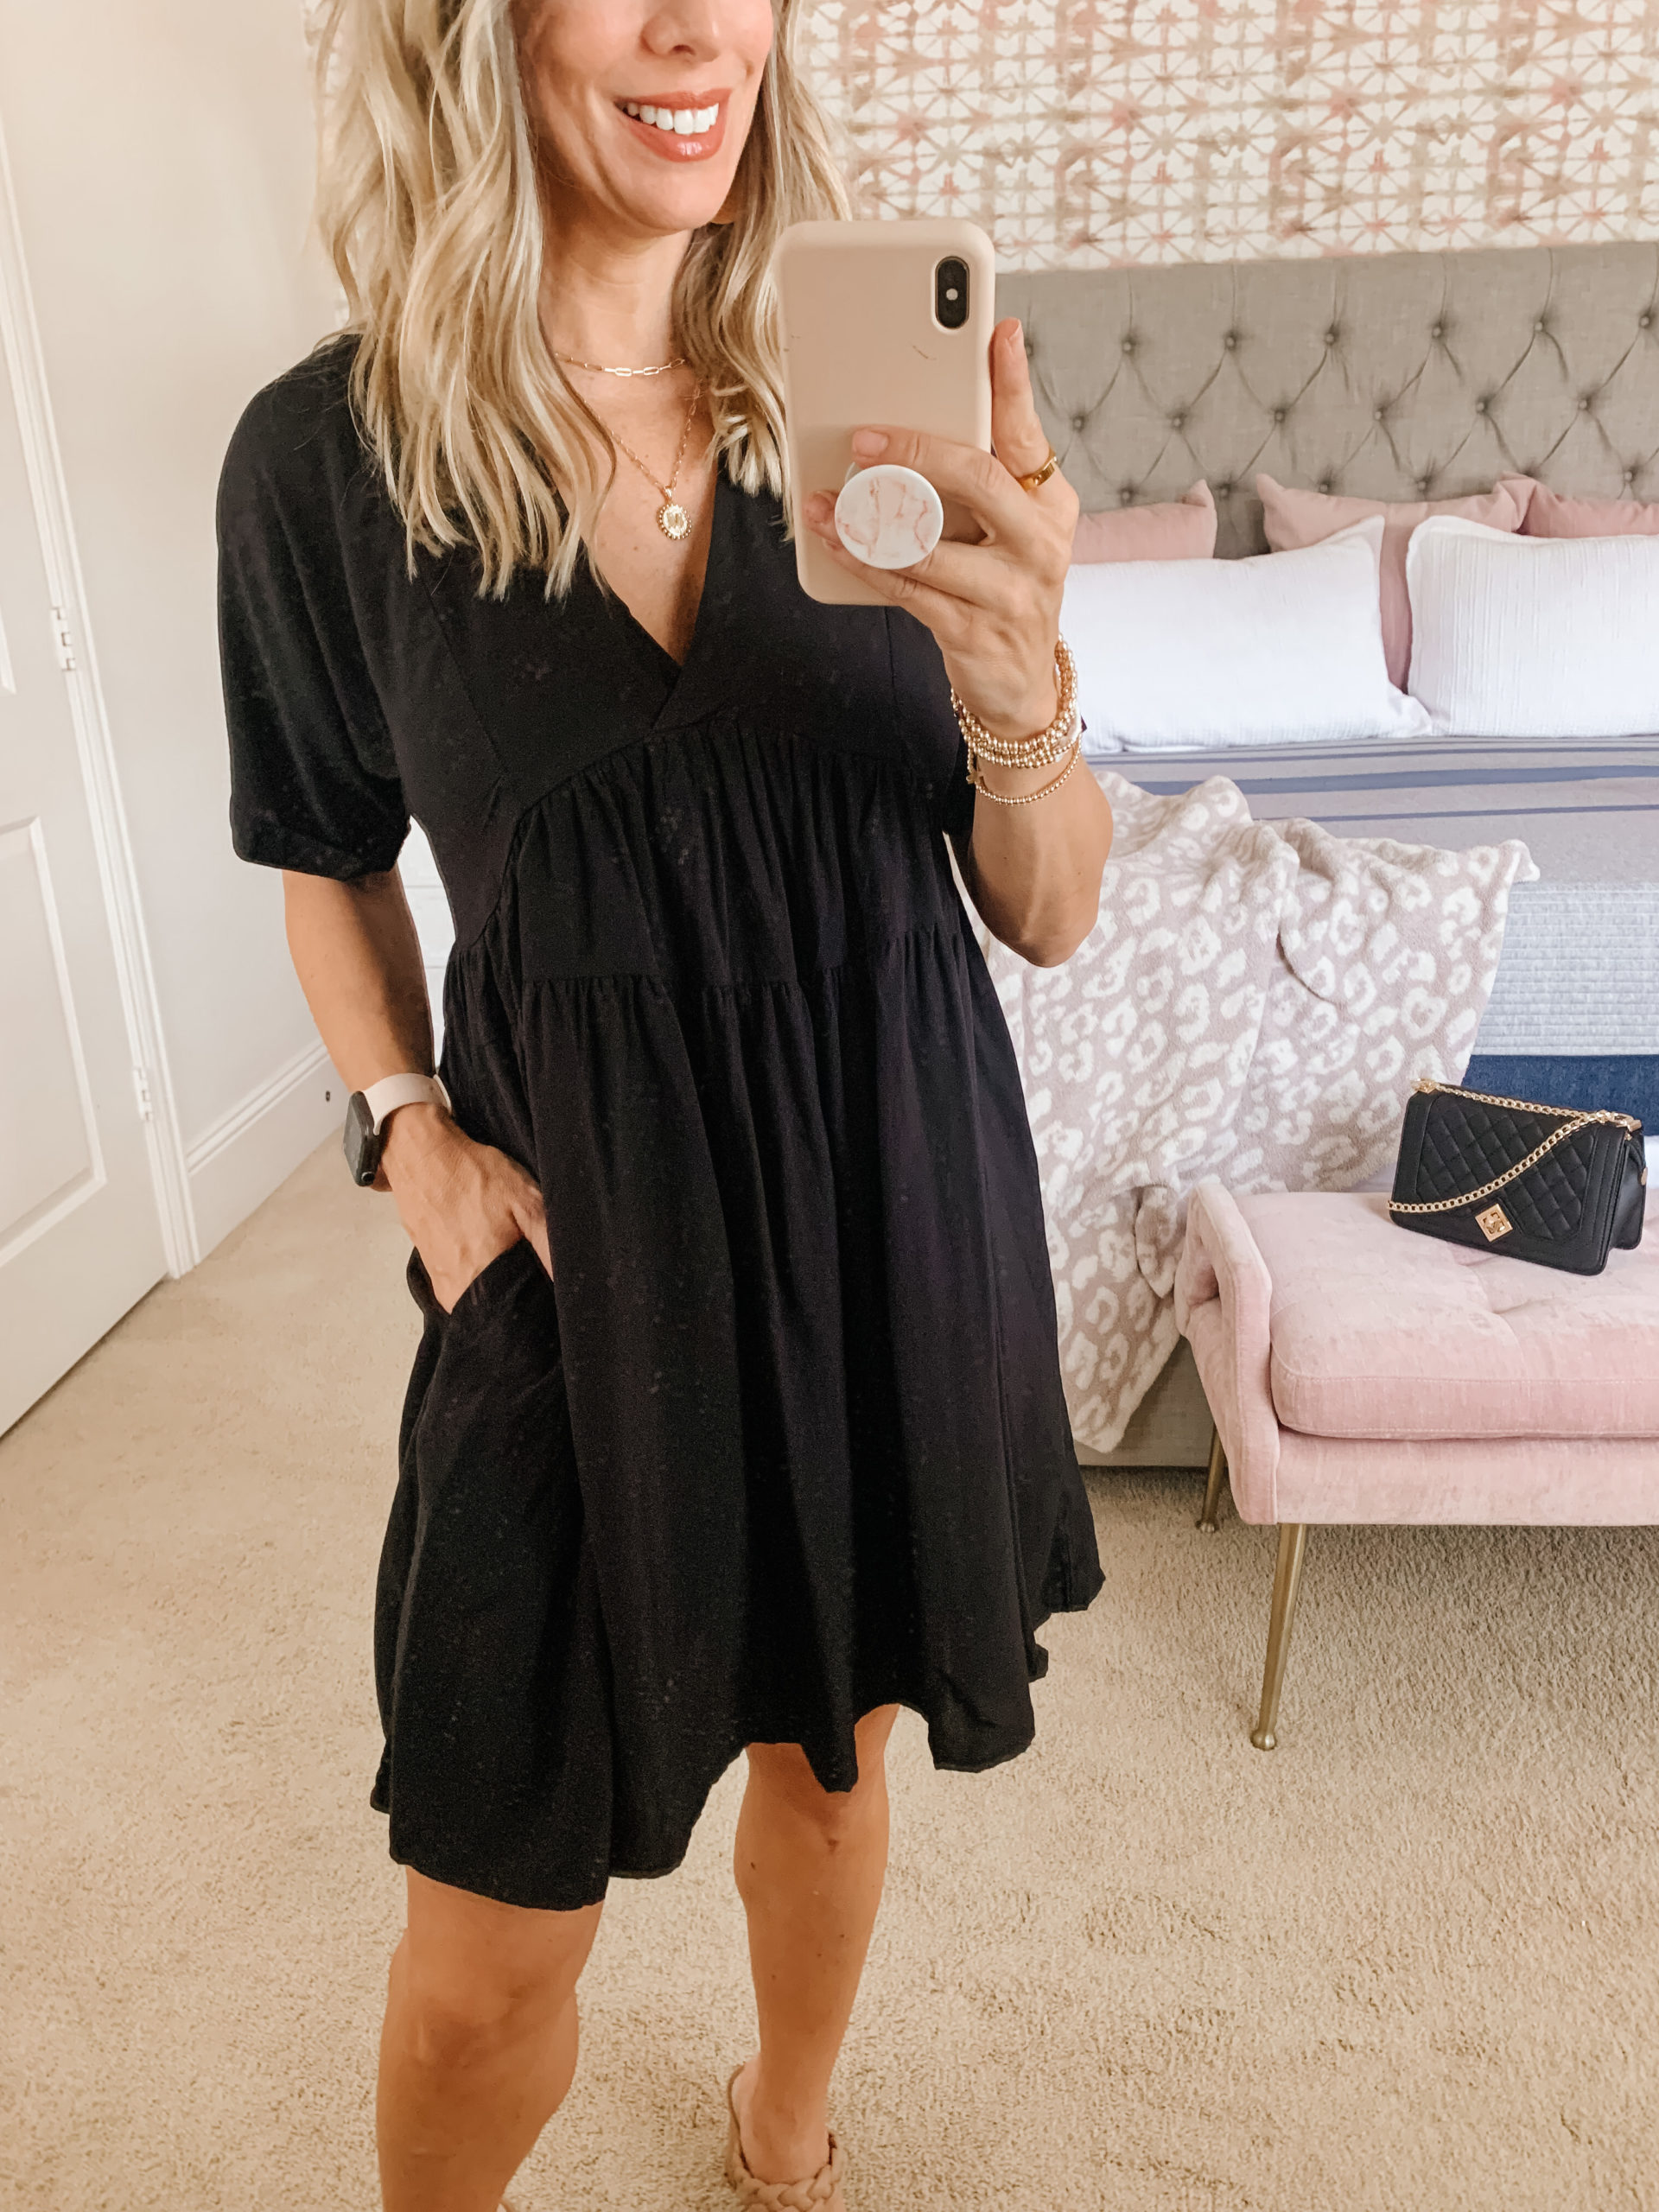 Amazon Fashion, Black Dress, Sandals, Crossbody